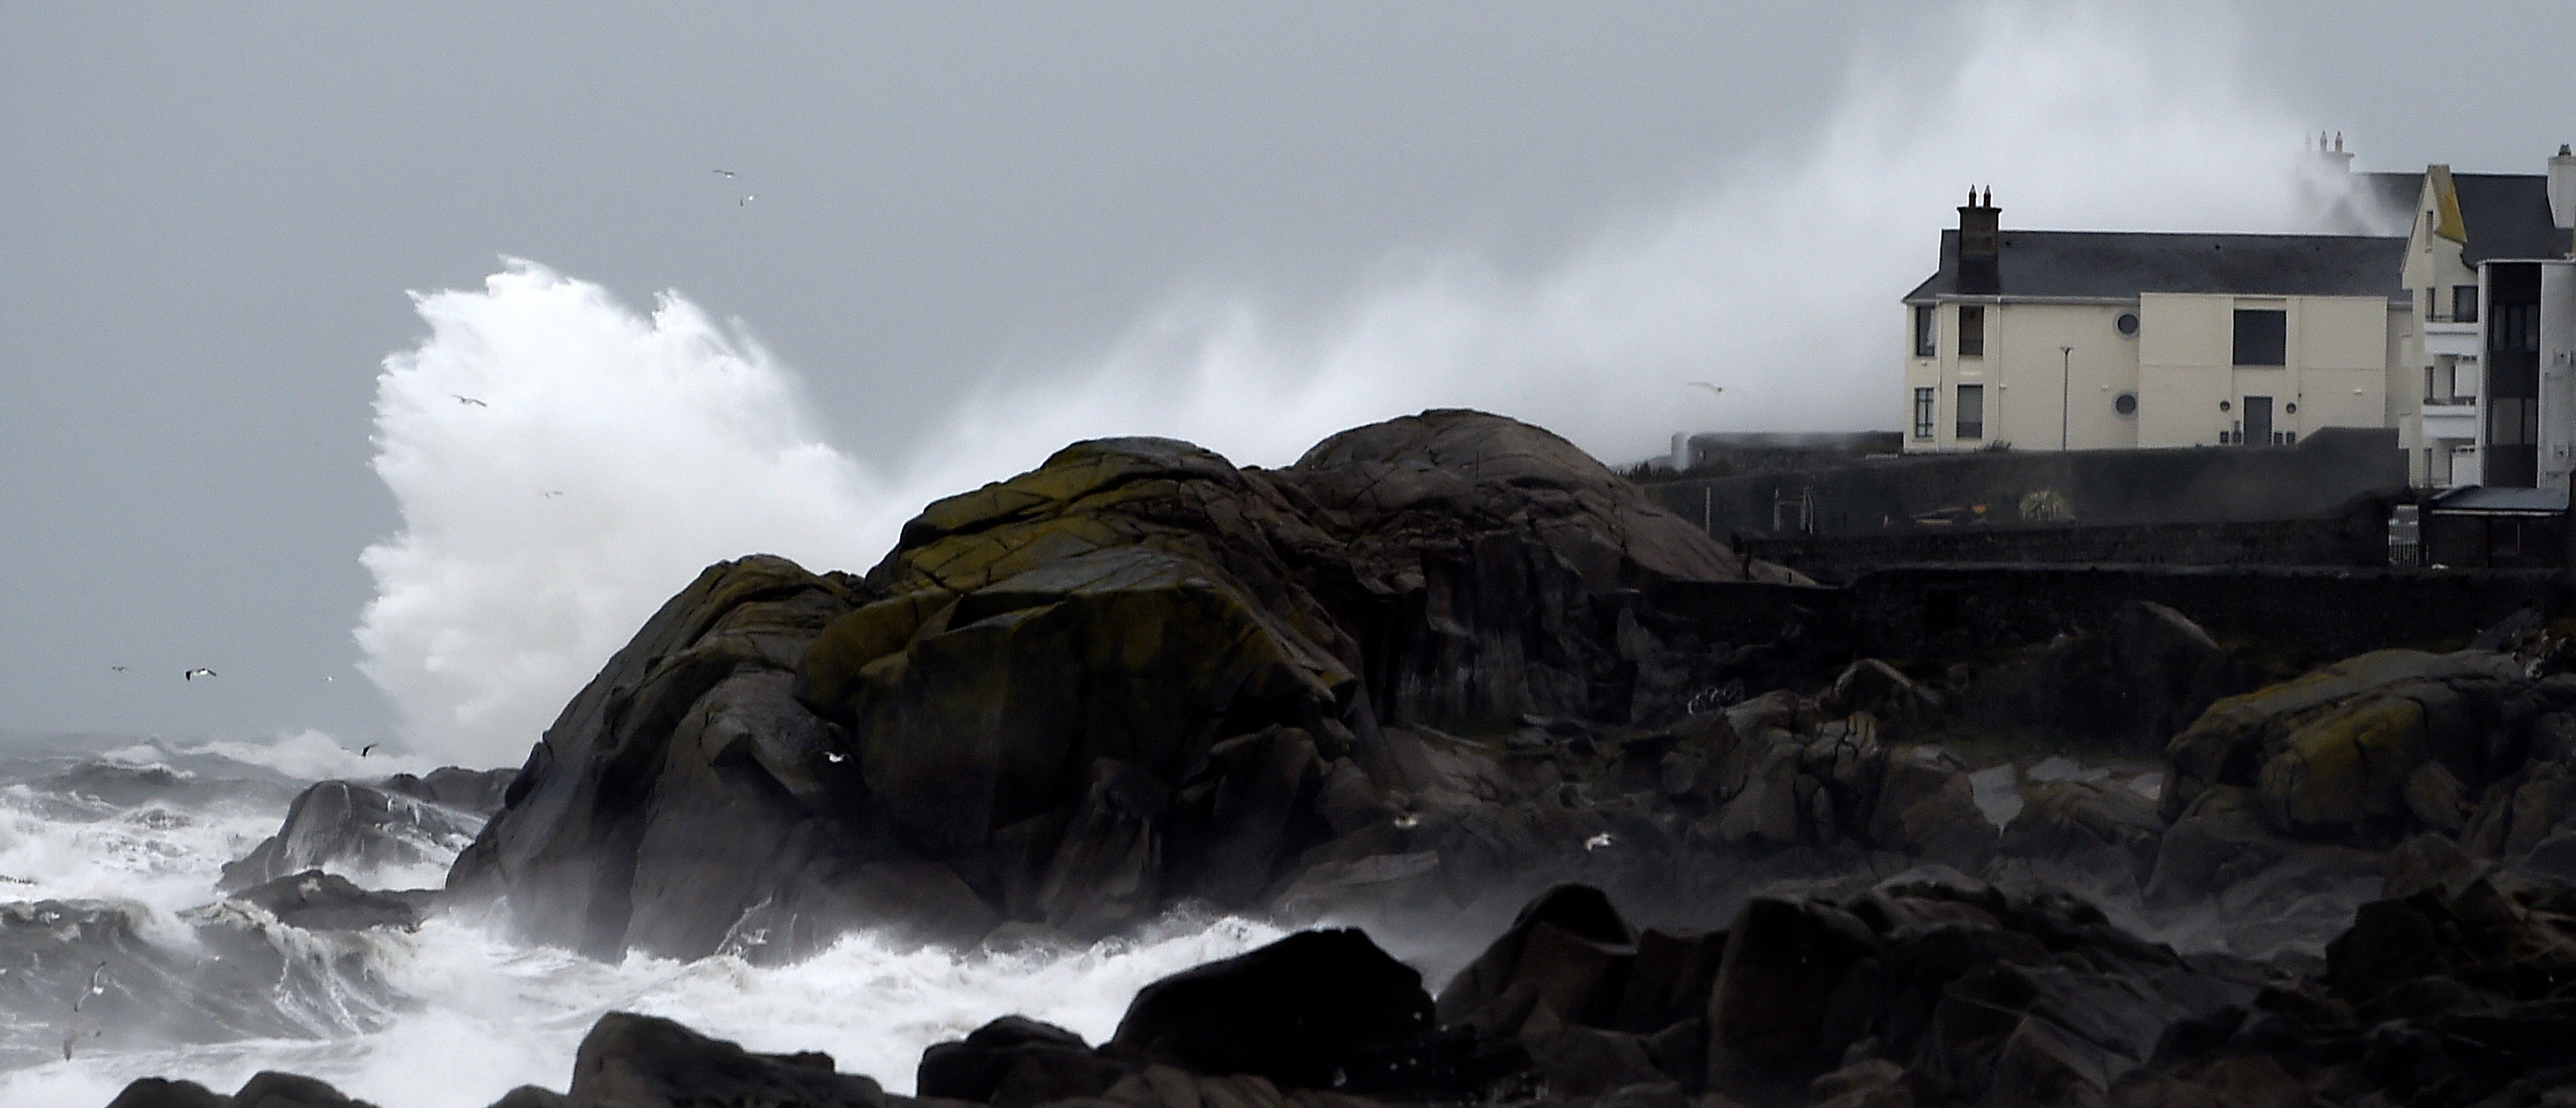 Huge waves break over Dalkey harbour as Storm Emma makes landfall in Dublin, Ireland March 1, 2018. REUTERS/Clodagh Kilcoyne